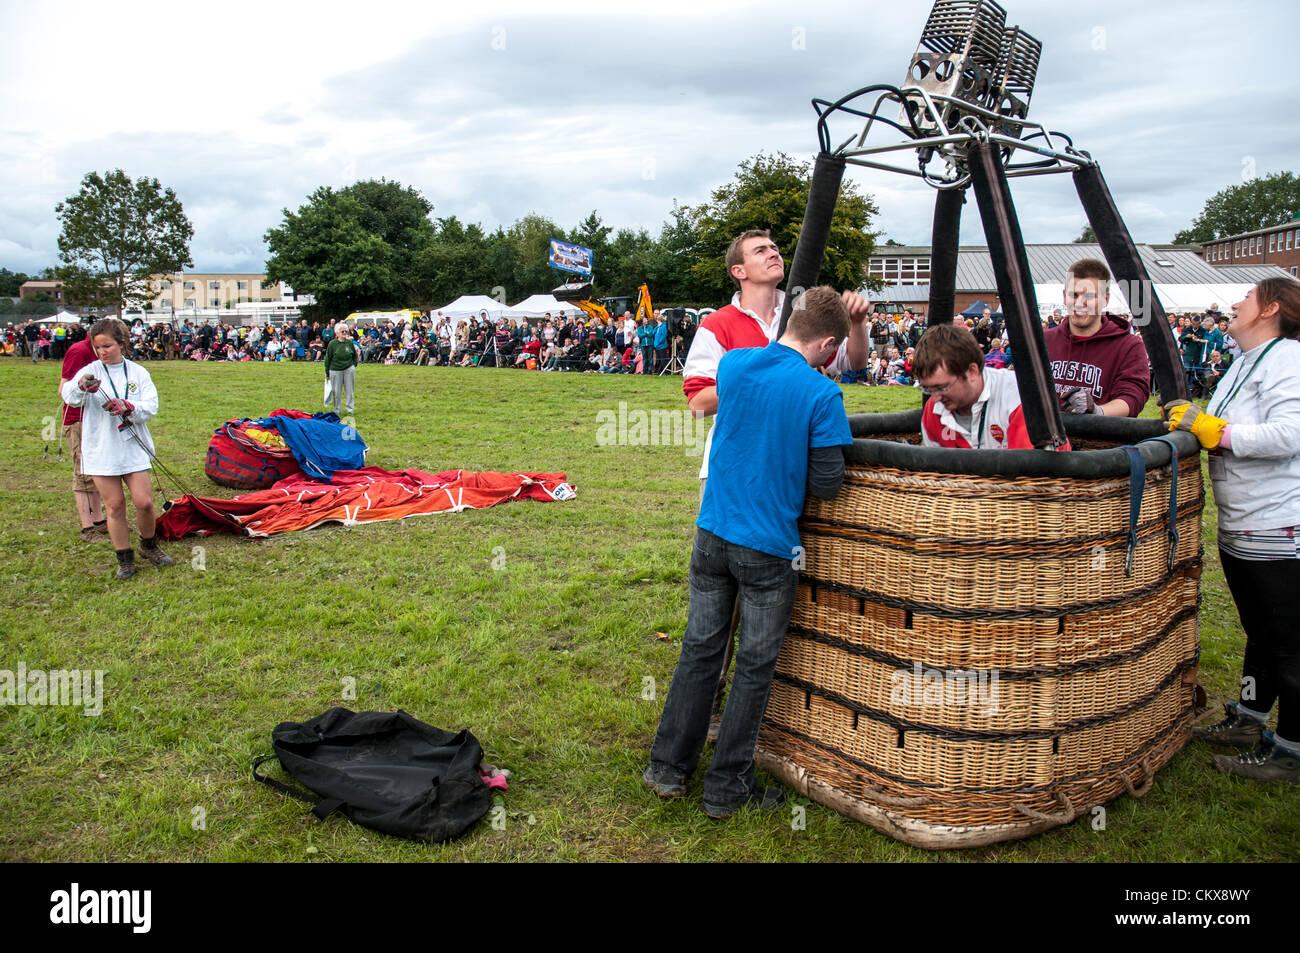 26th Aug 2012. The John Harris (G-CDWD)  University of Bristol balloon is prepared for launch at the Tiverton balloon festival in Tiverton, Devon, UK. Stock Photo